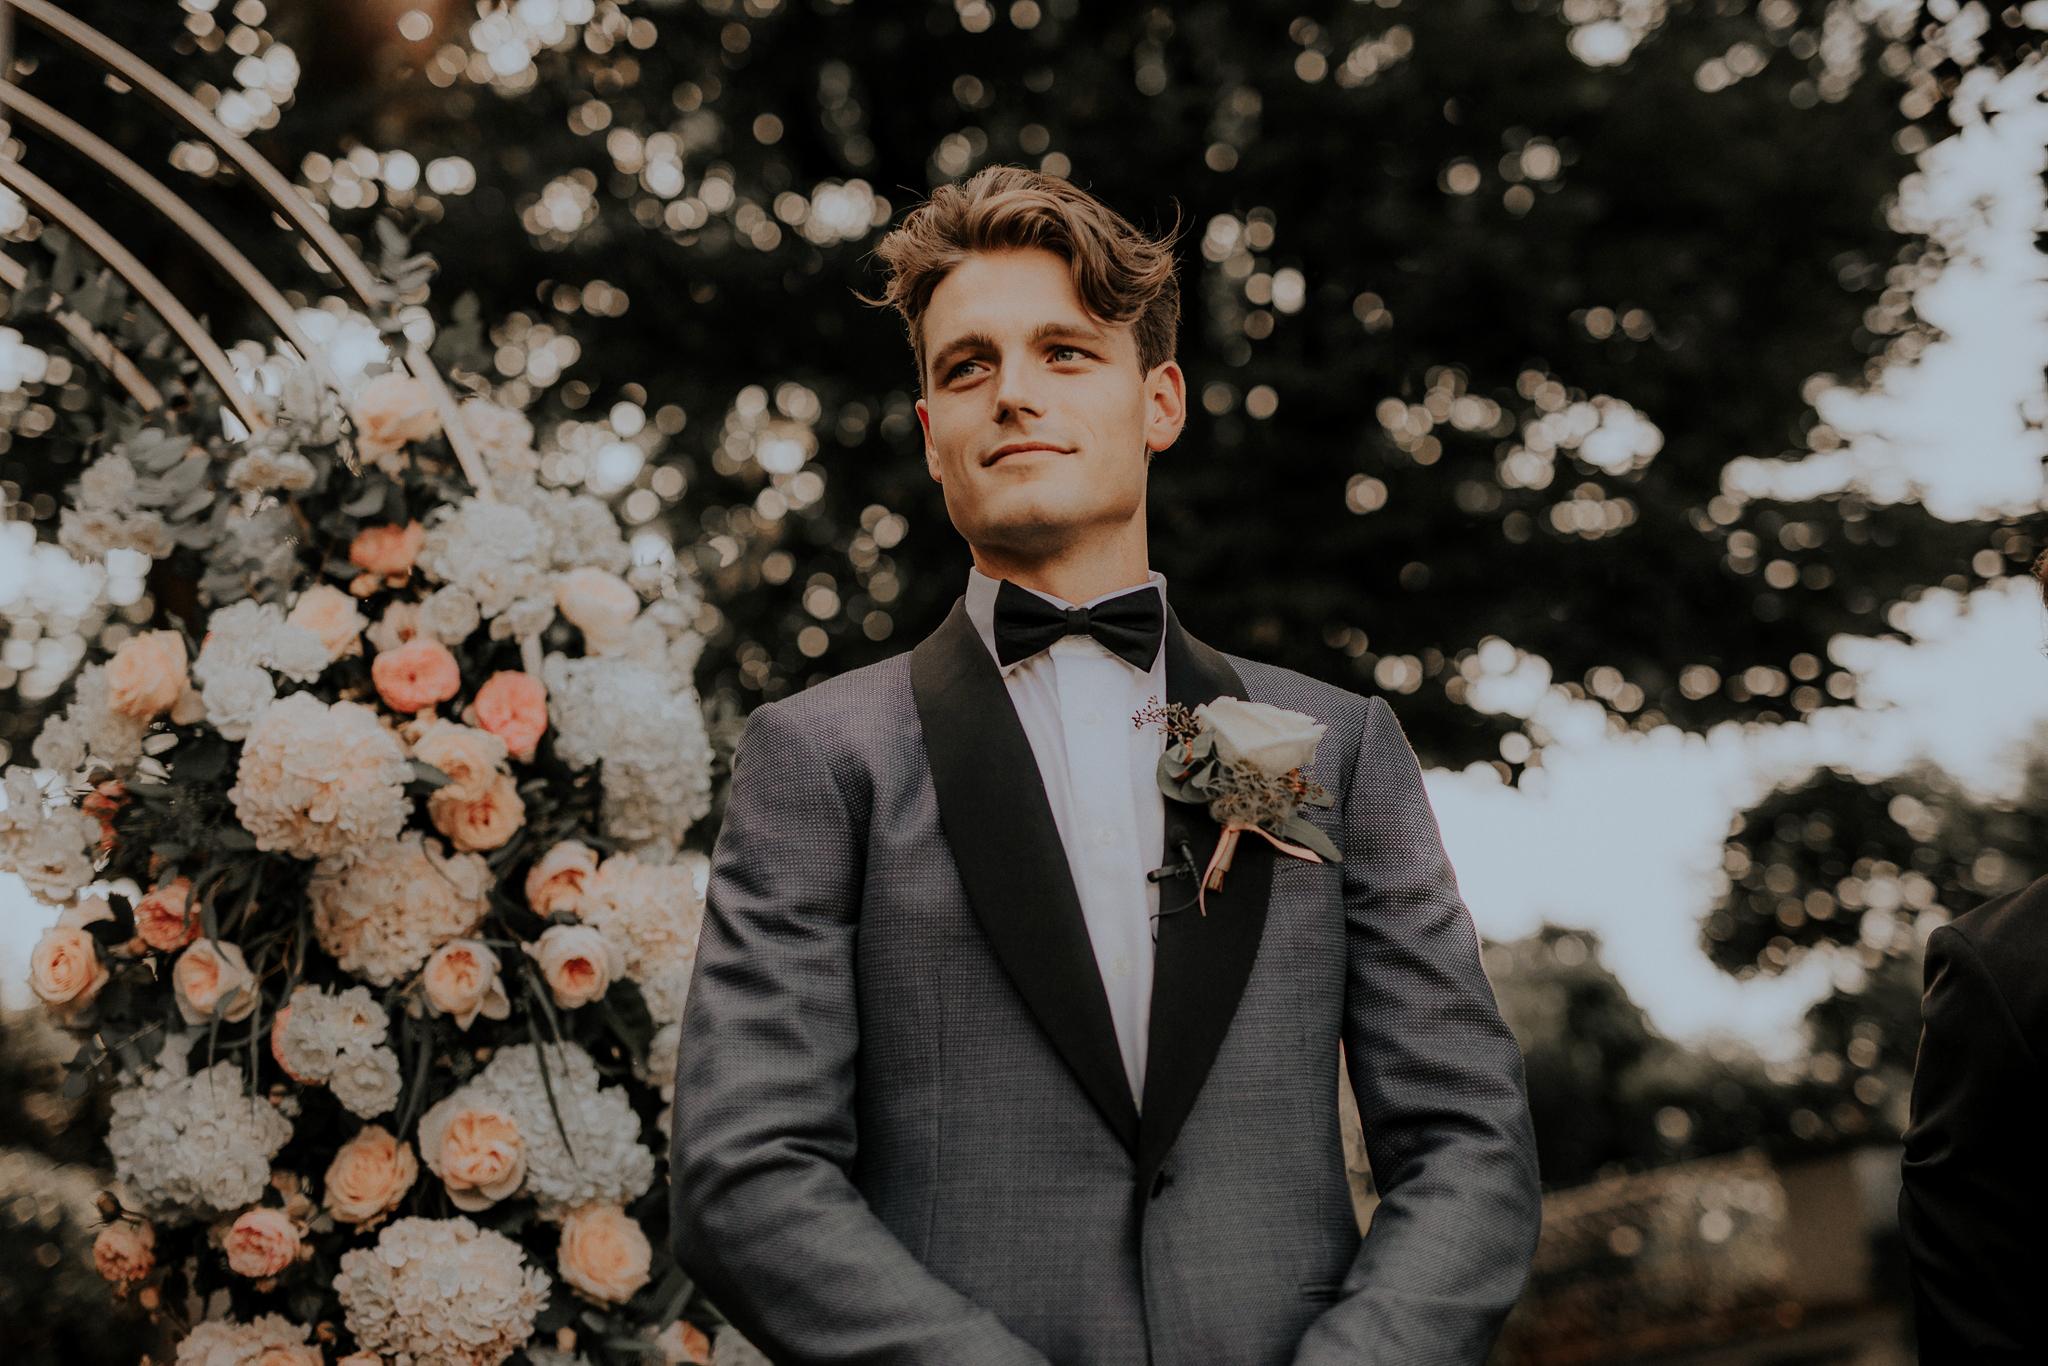 destination-austin-wedding-photographer-italy-florence473.JPG